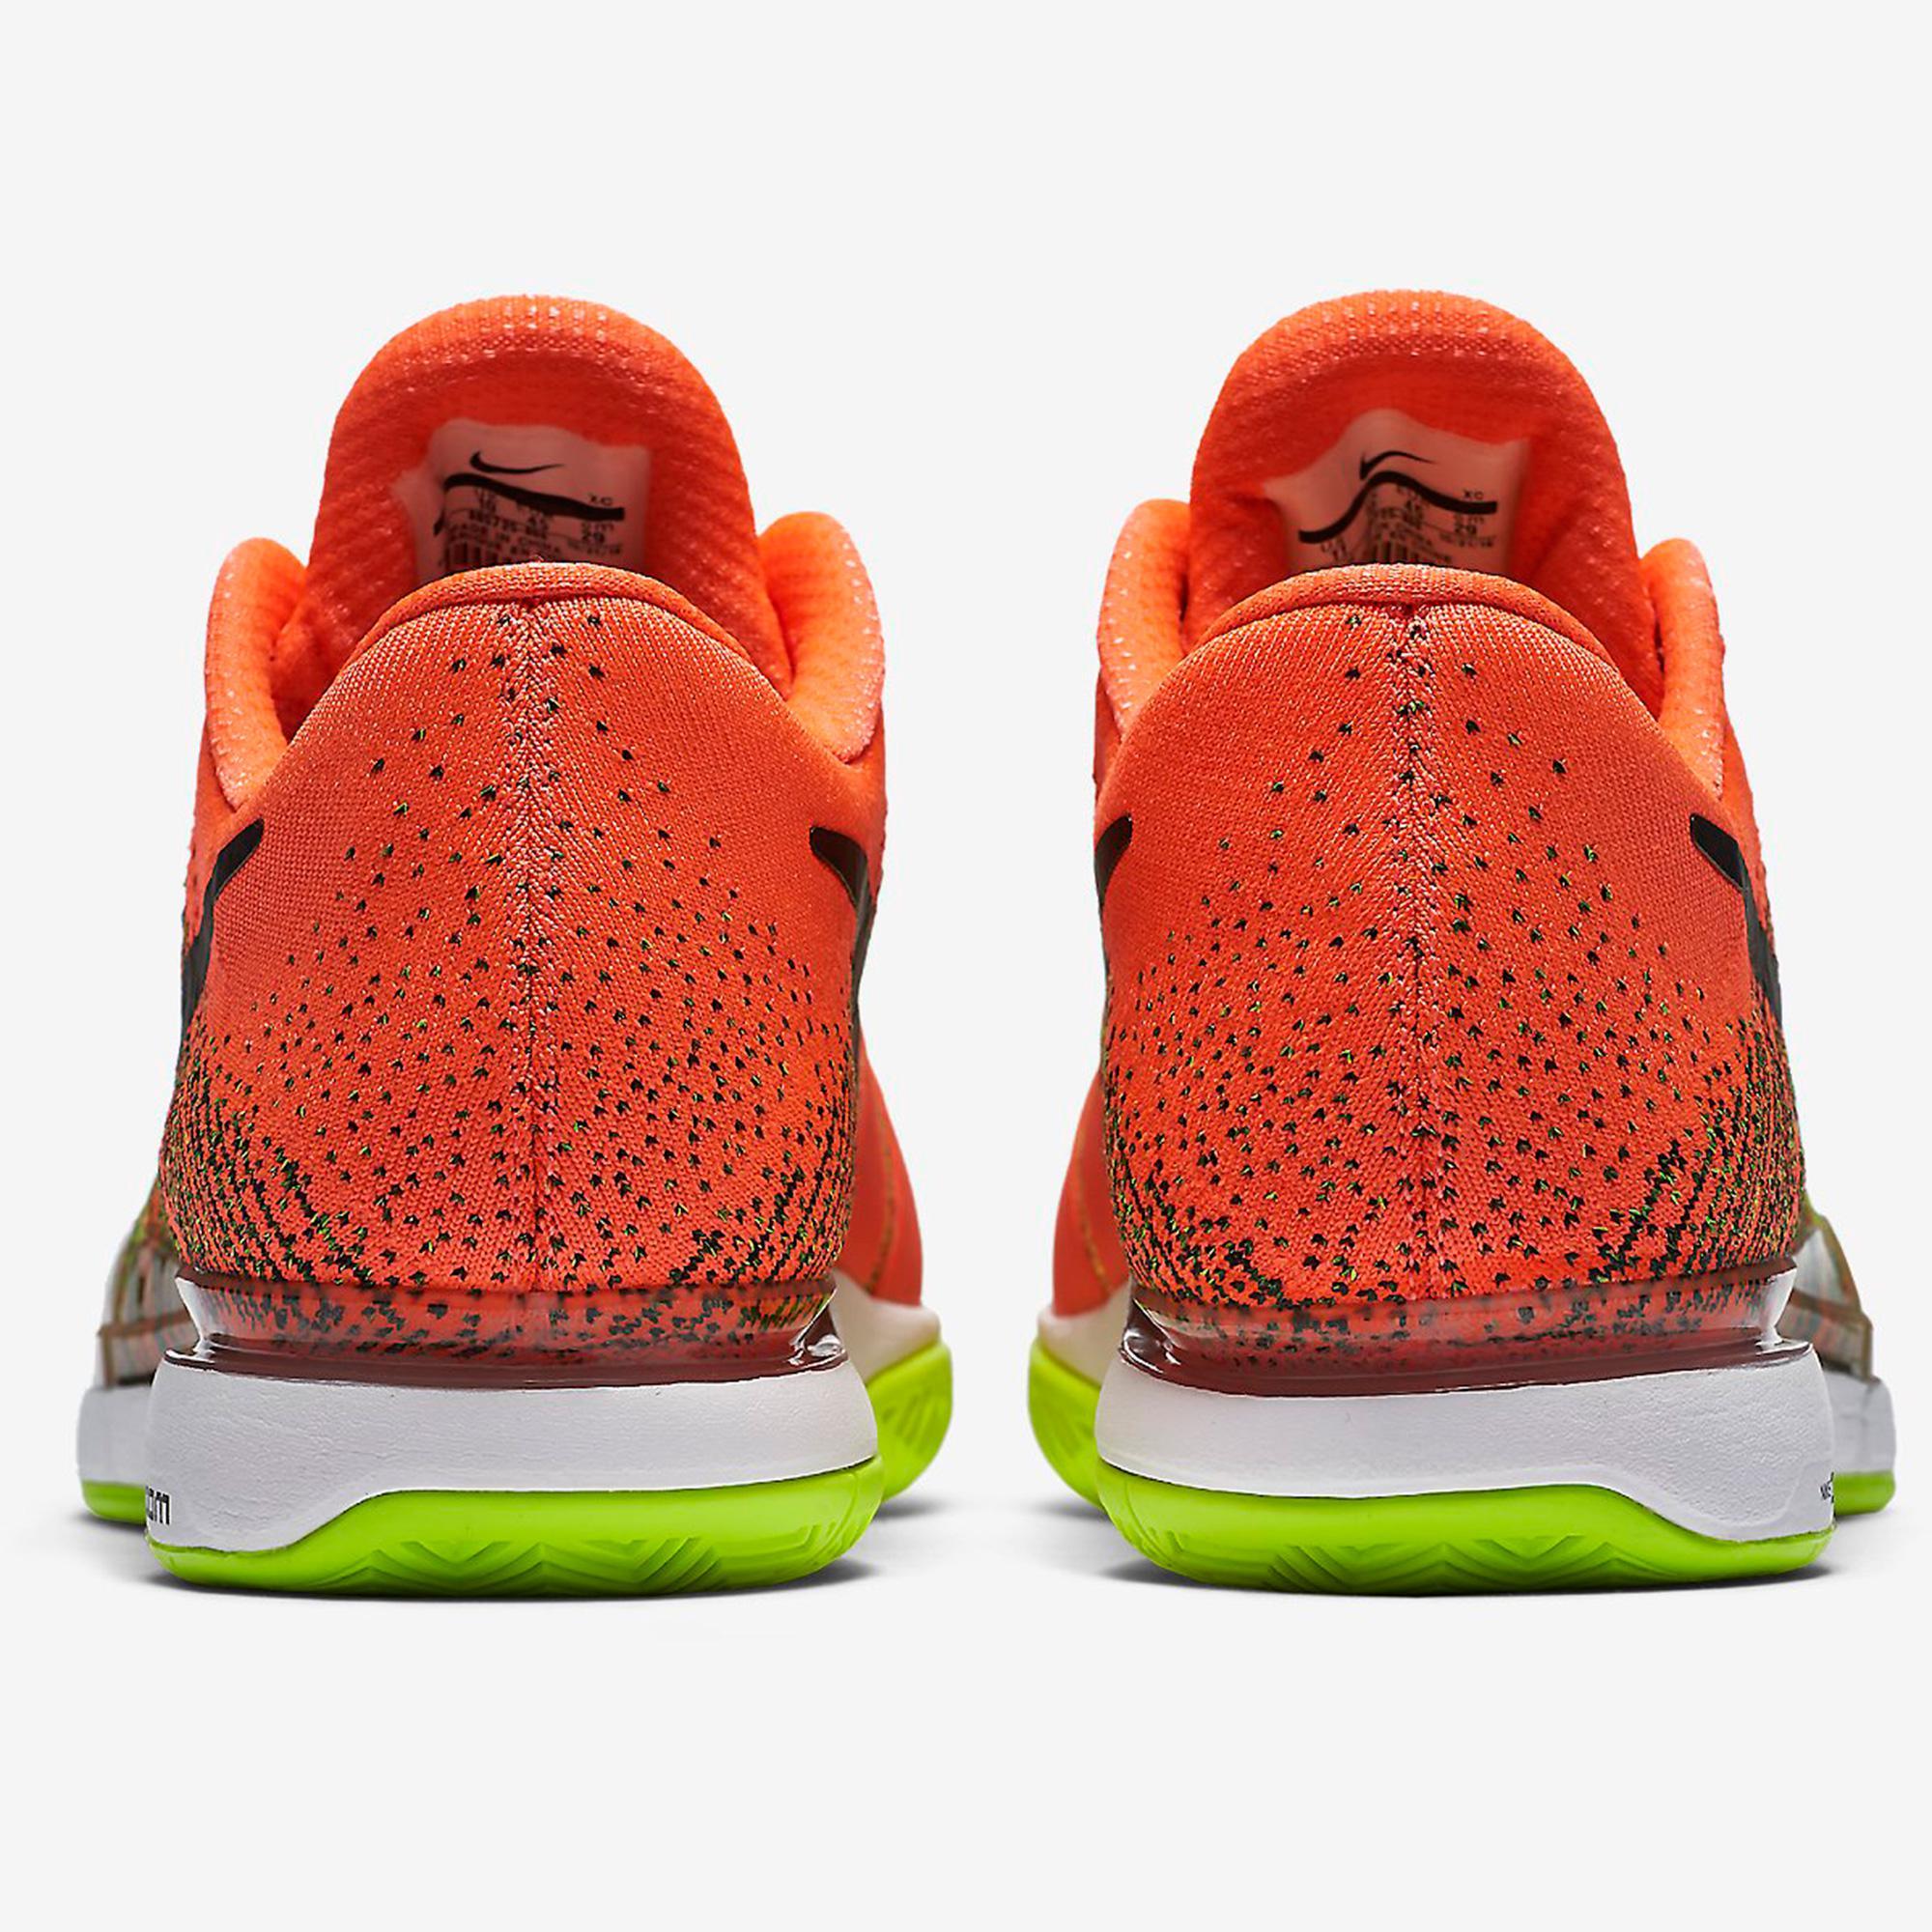 Inútil legislación Definir  Nike Mens Zoom Vapor 9.5 Flyknit Tennis Shoes - Hyper Orange -  Tennisnuts.com